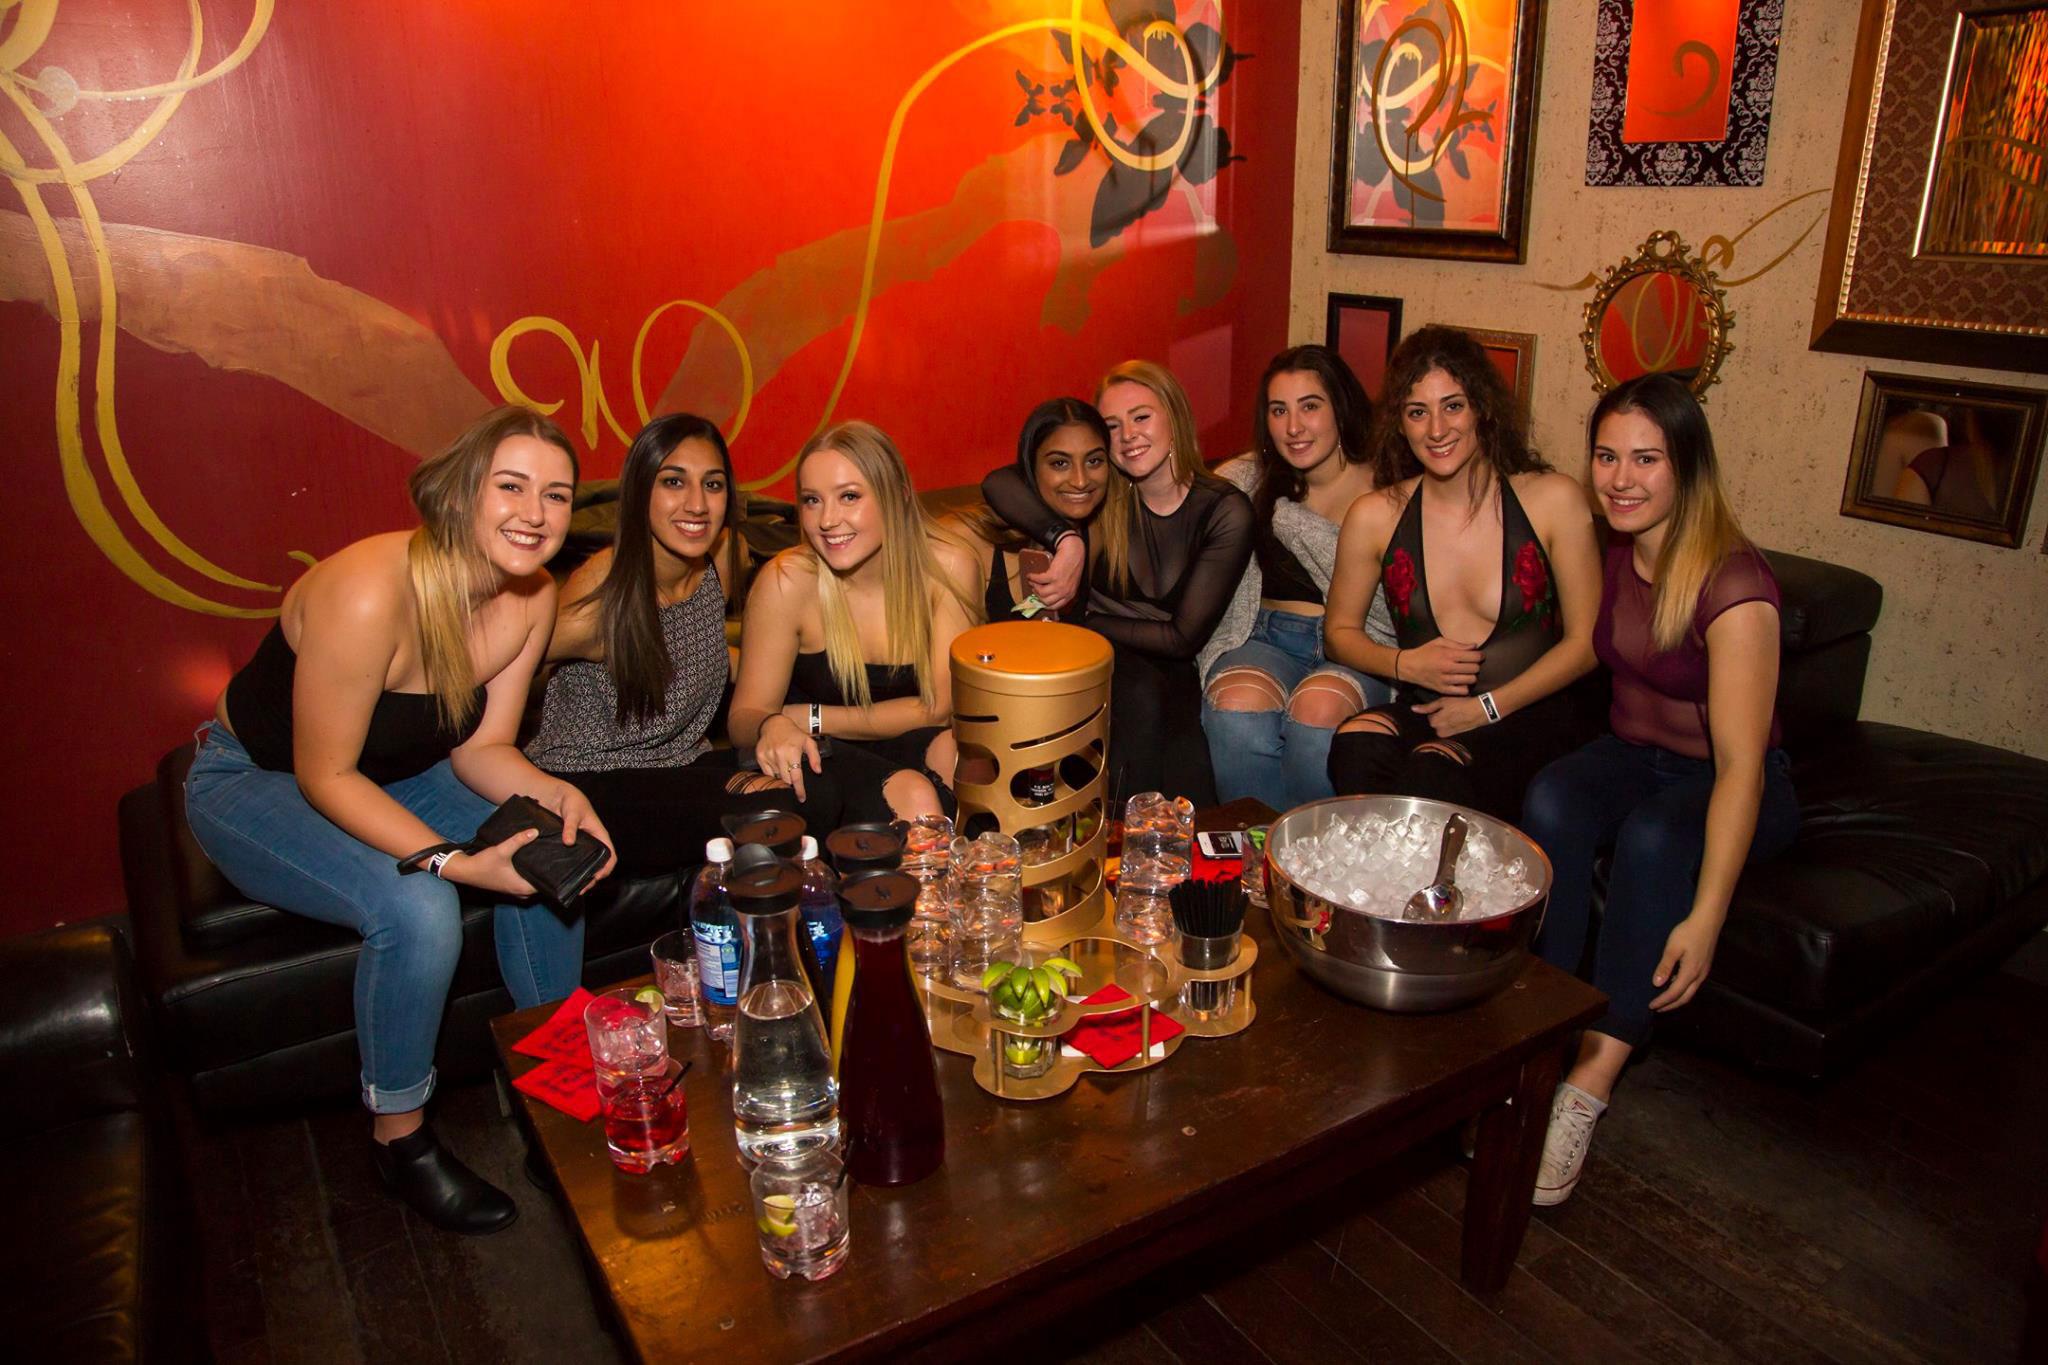 taboo nightclub halifax grafton connor group